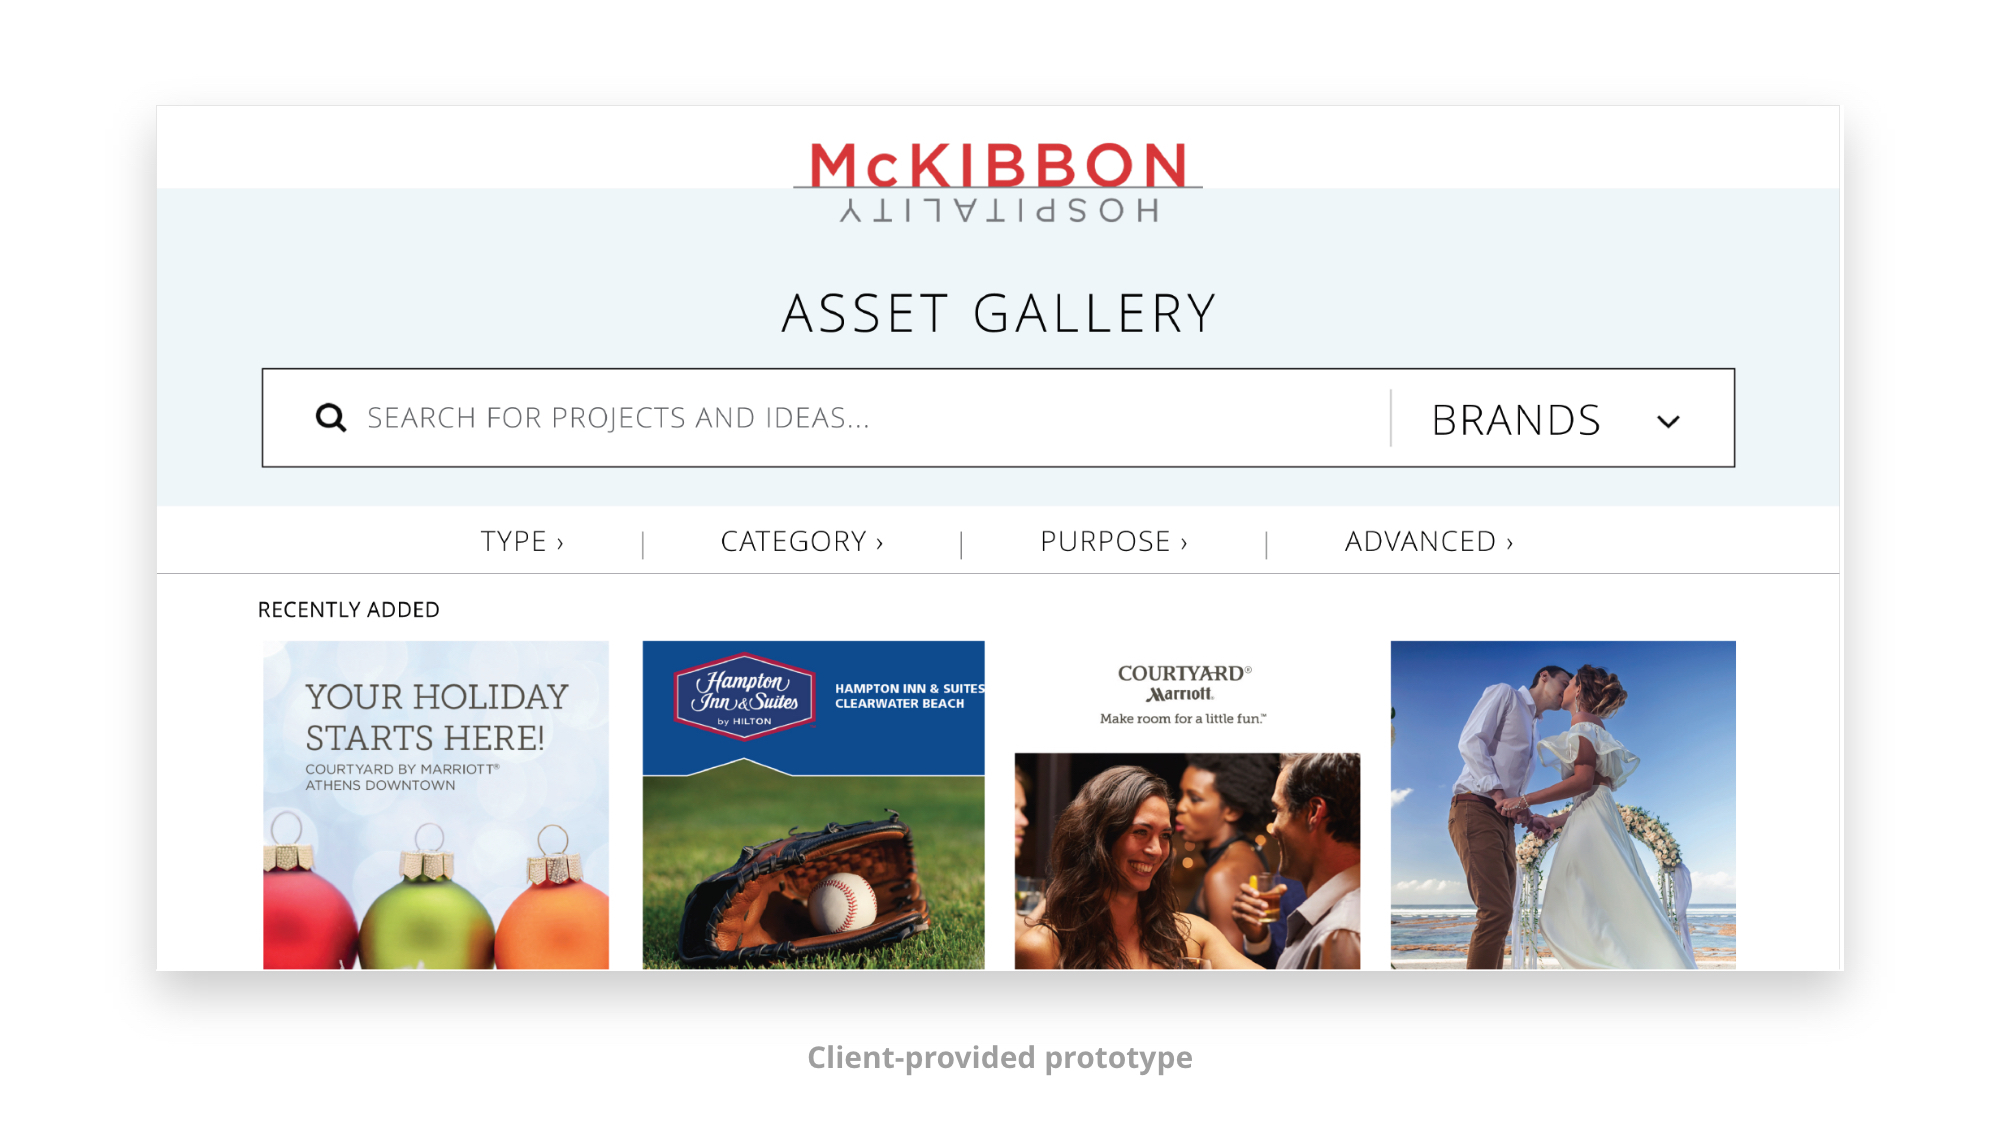 McKibbon Asset Gallery Prototype